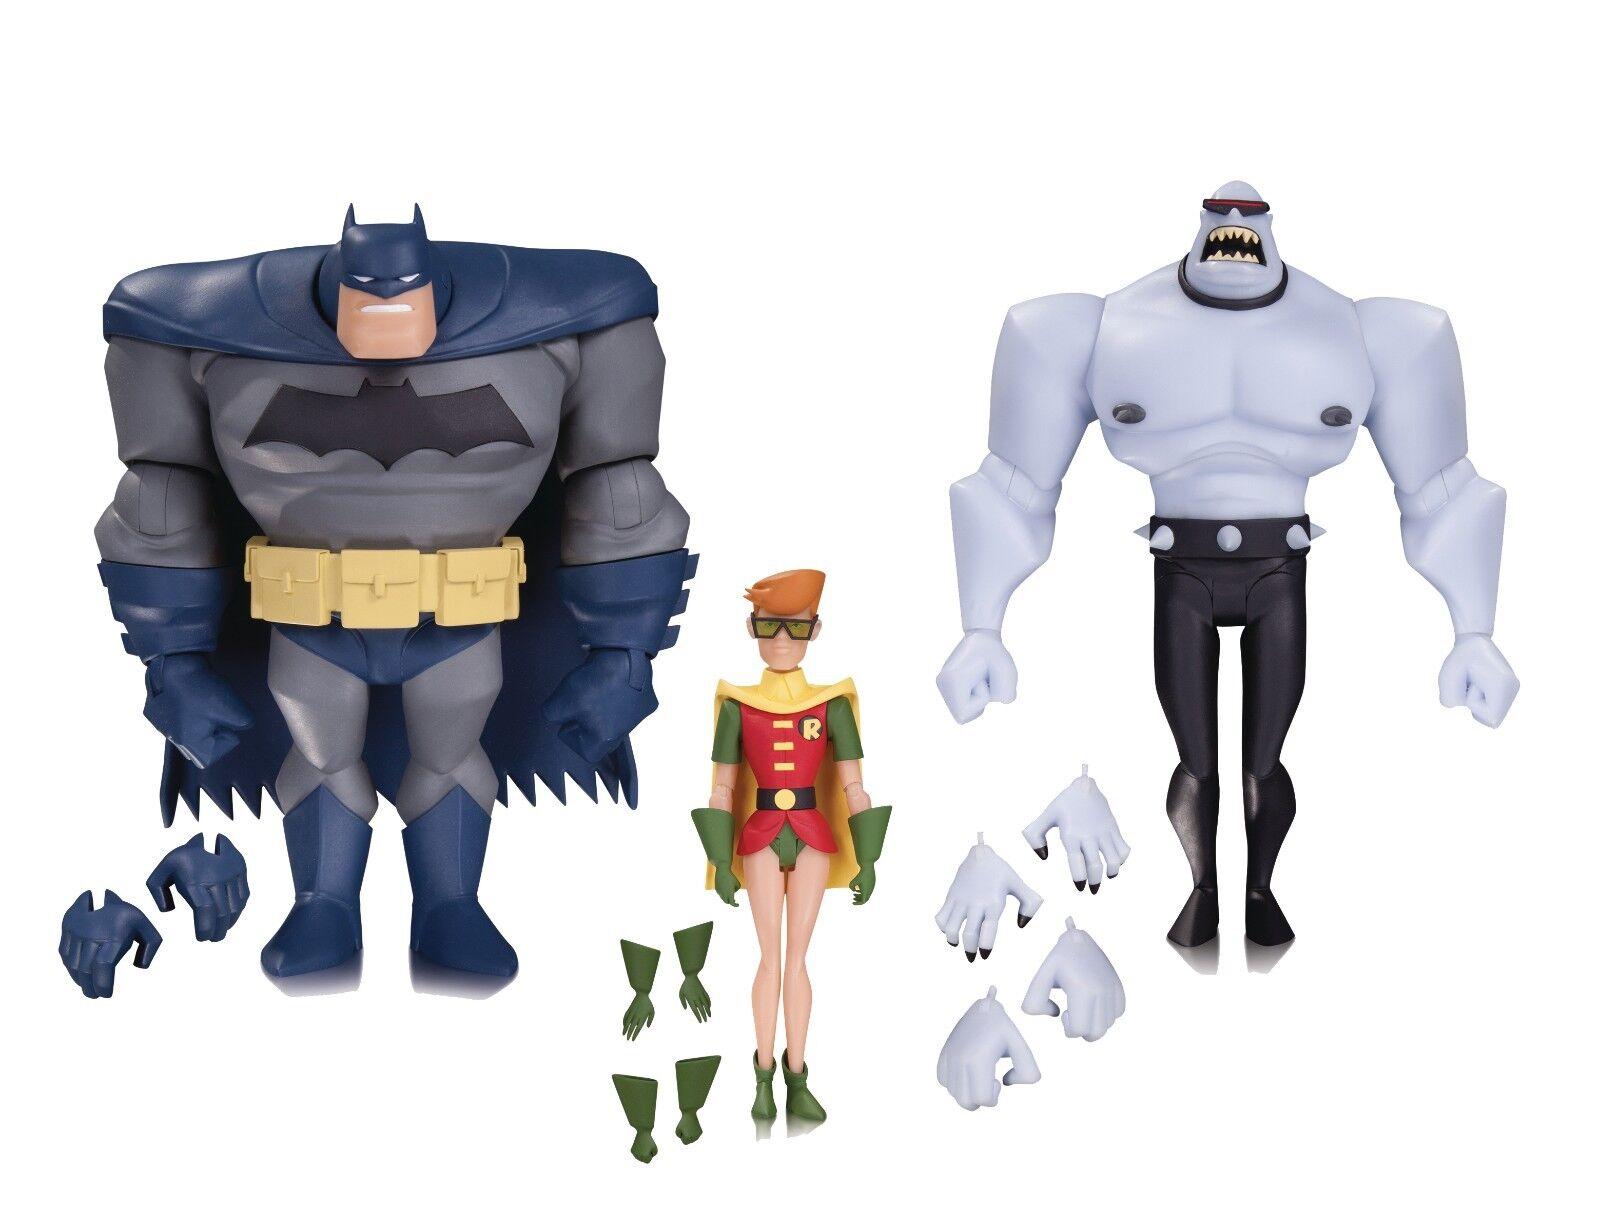 Batman Animated Batman Robin Mutant 3 Pack Action Figures - UK Seller